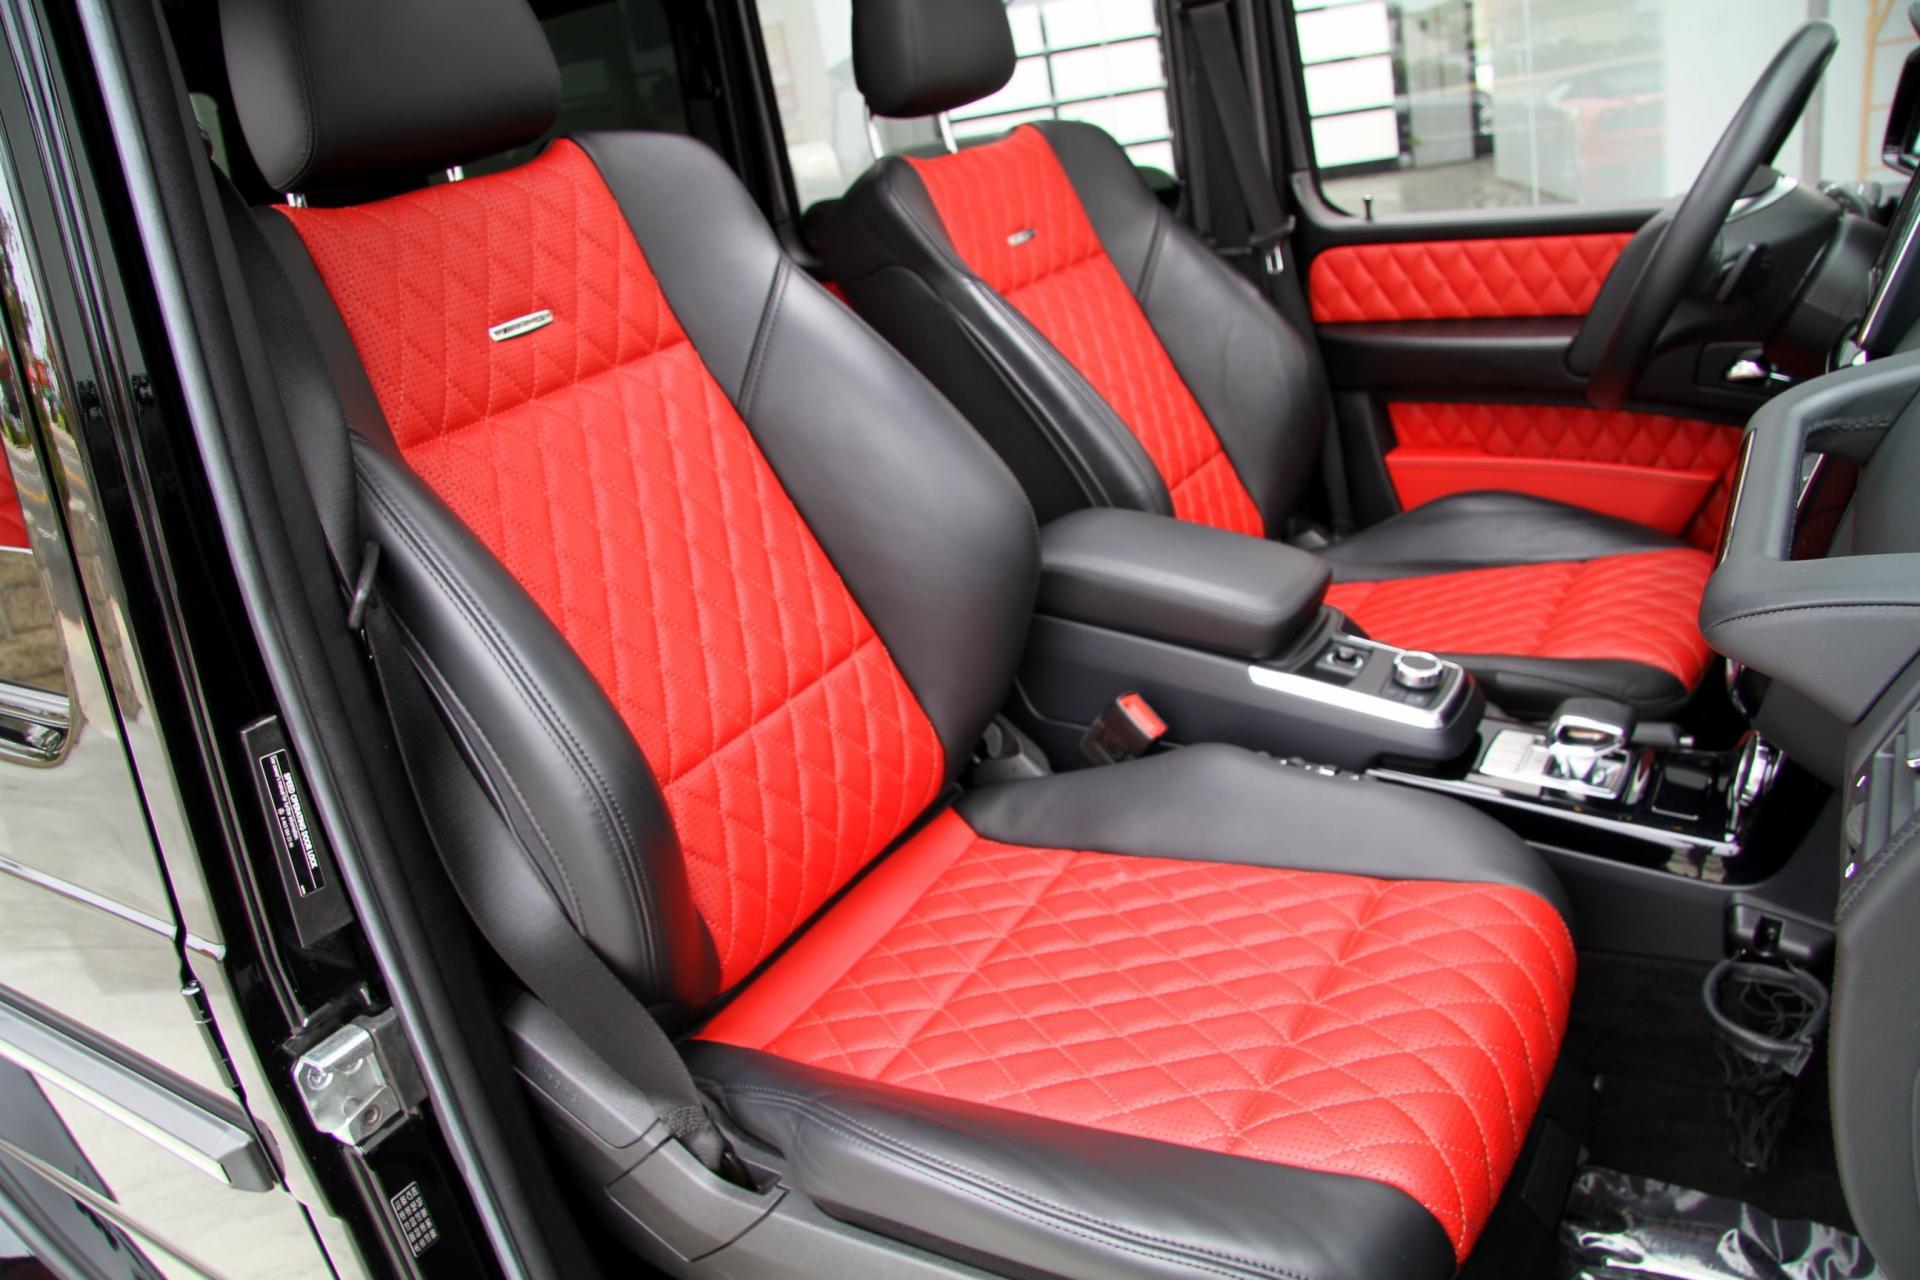 2015 Mercedes Benz G63 Amg 4matic Diamond Stitched Seats